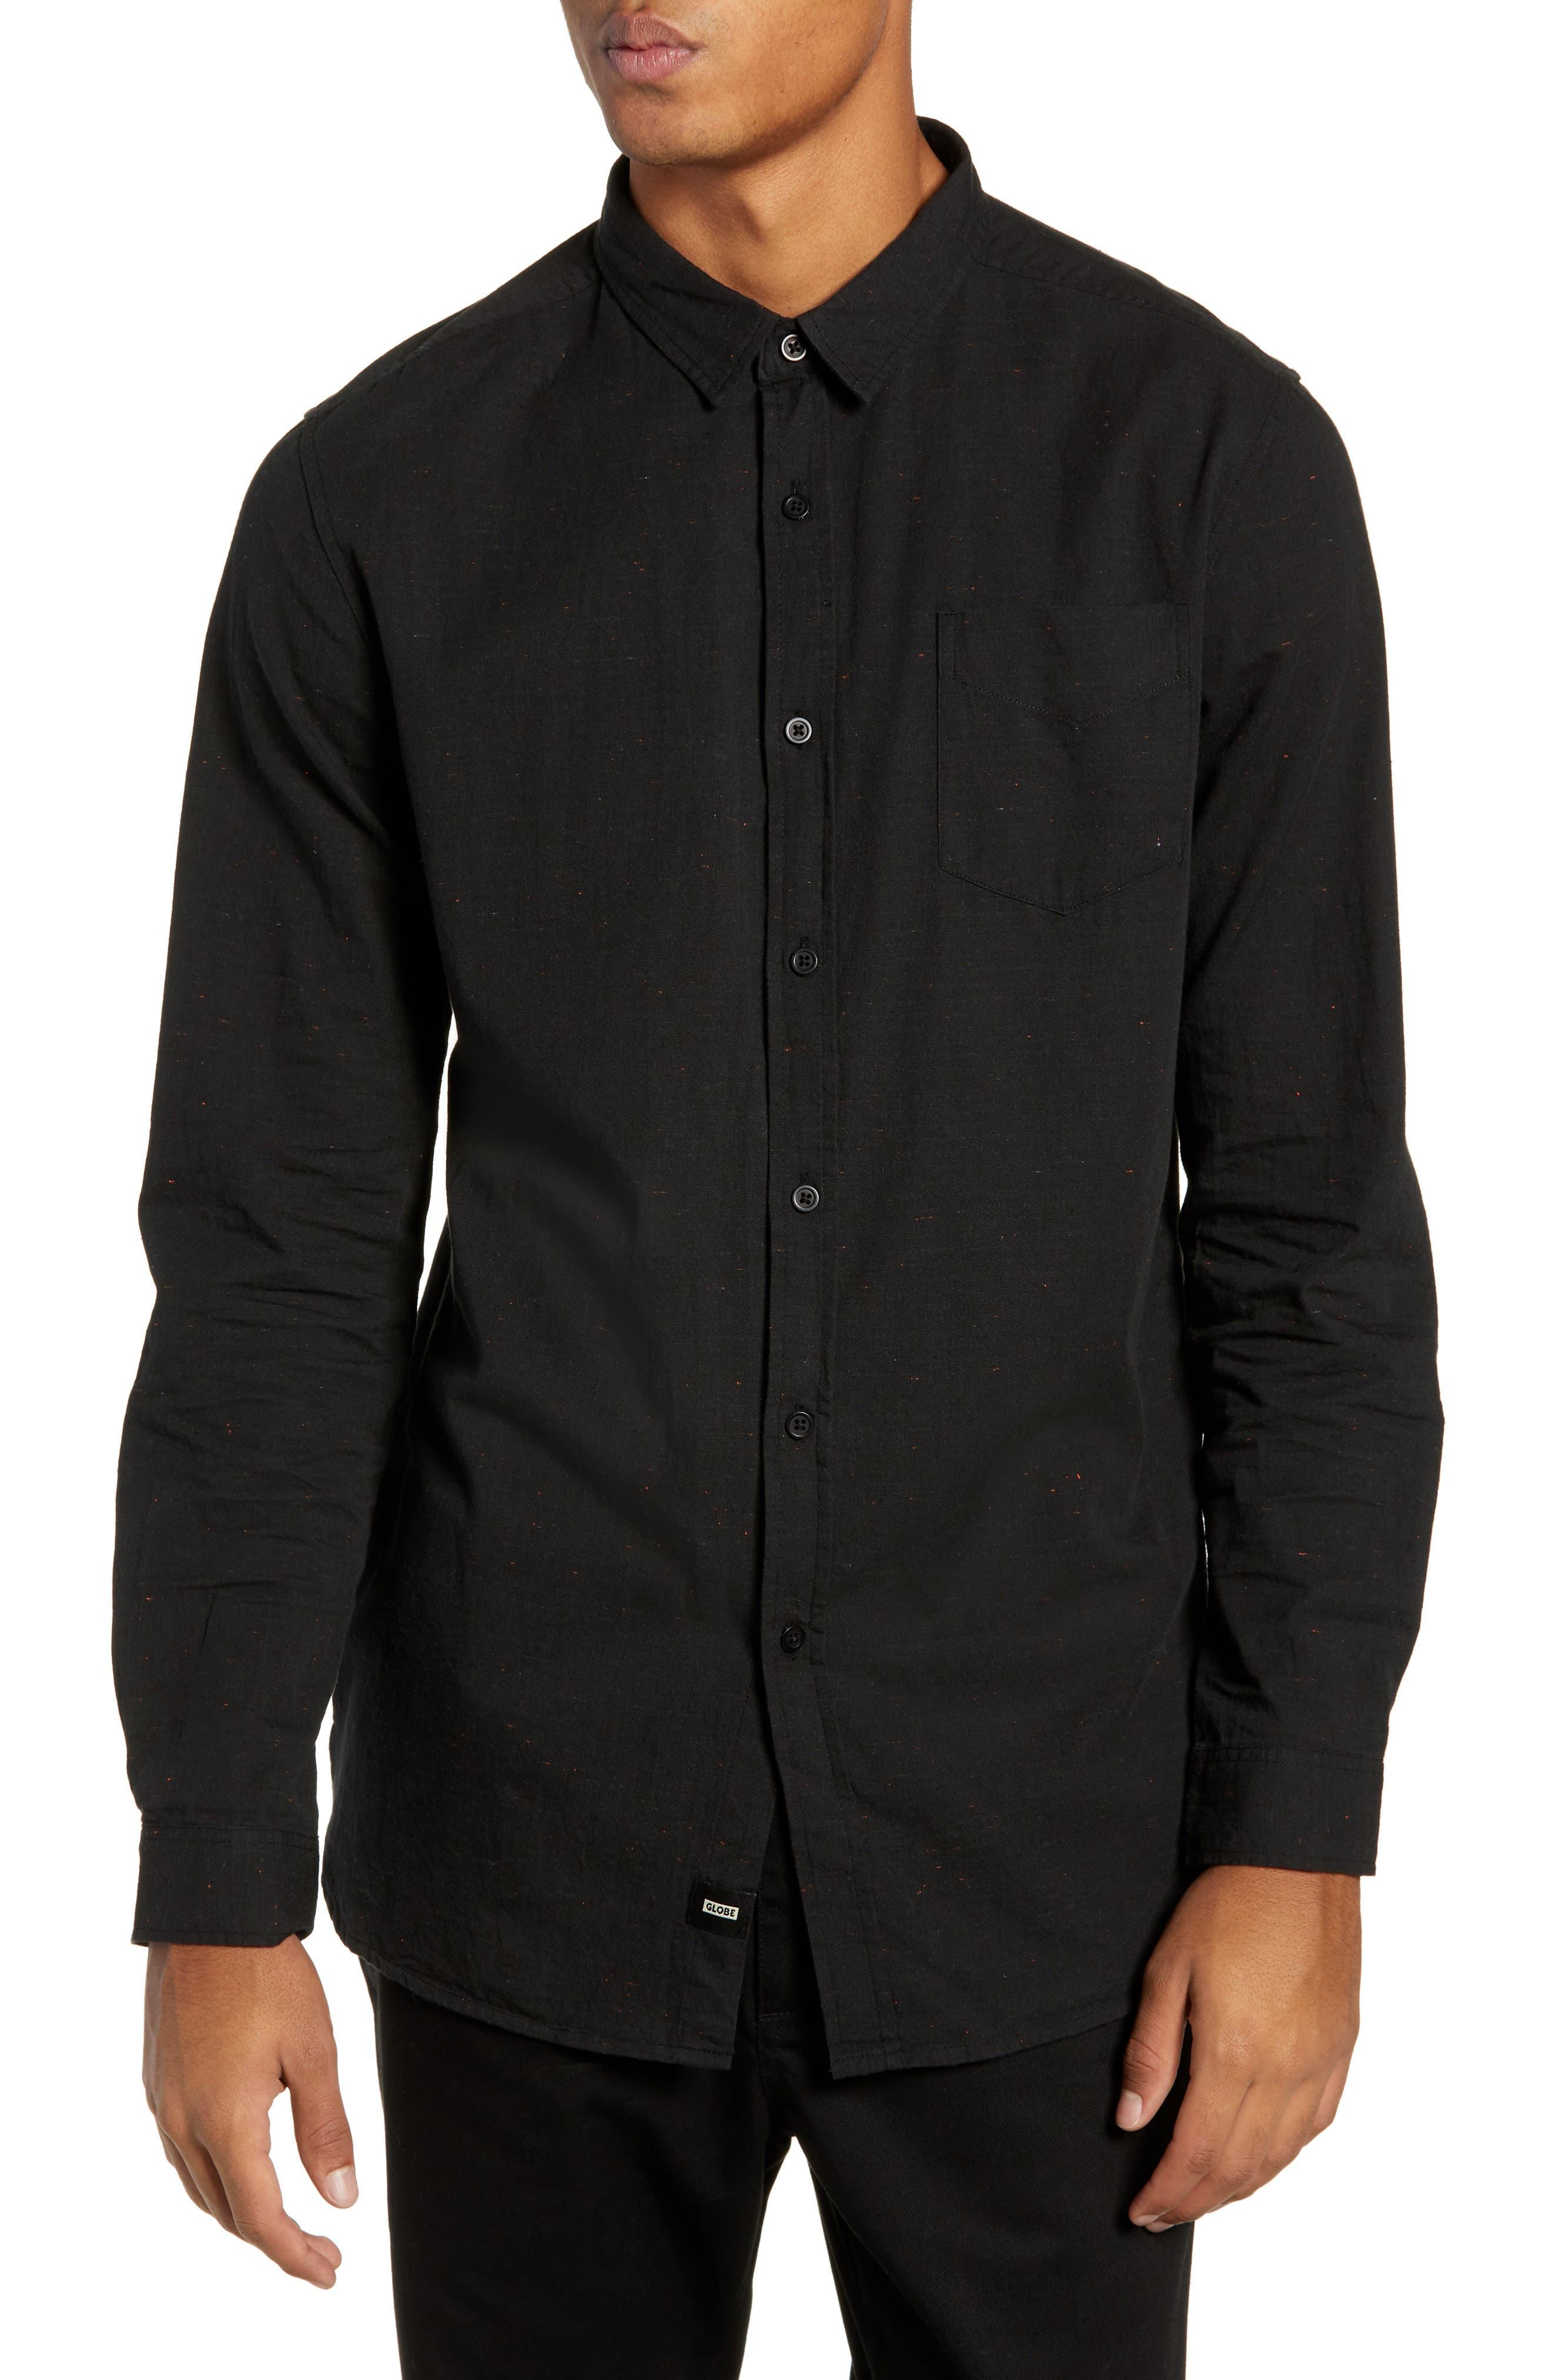 Goodstock Long Sleeve Shirt,                             Main thumbnail 1, color,                             LEAD